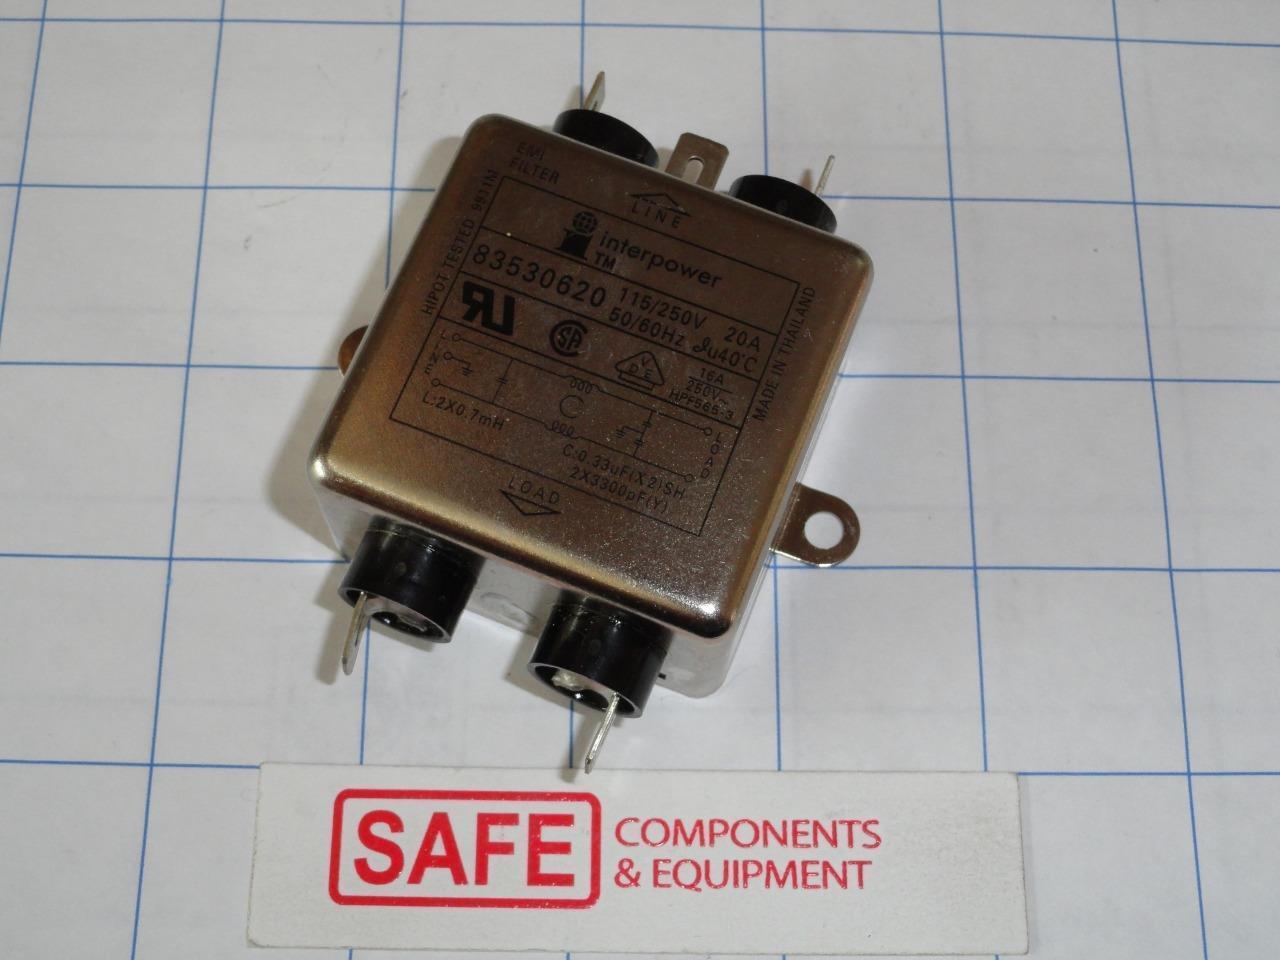 3VQ1 Power Line Filters 3A 1//4 QUIK CONN